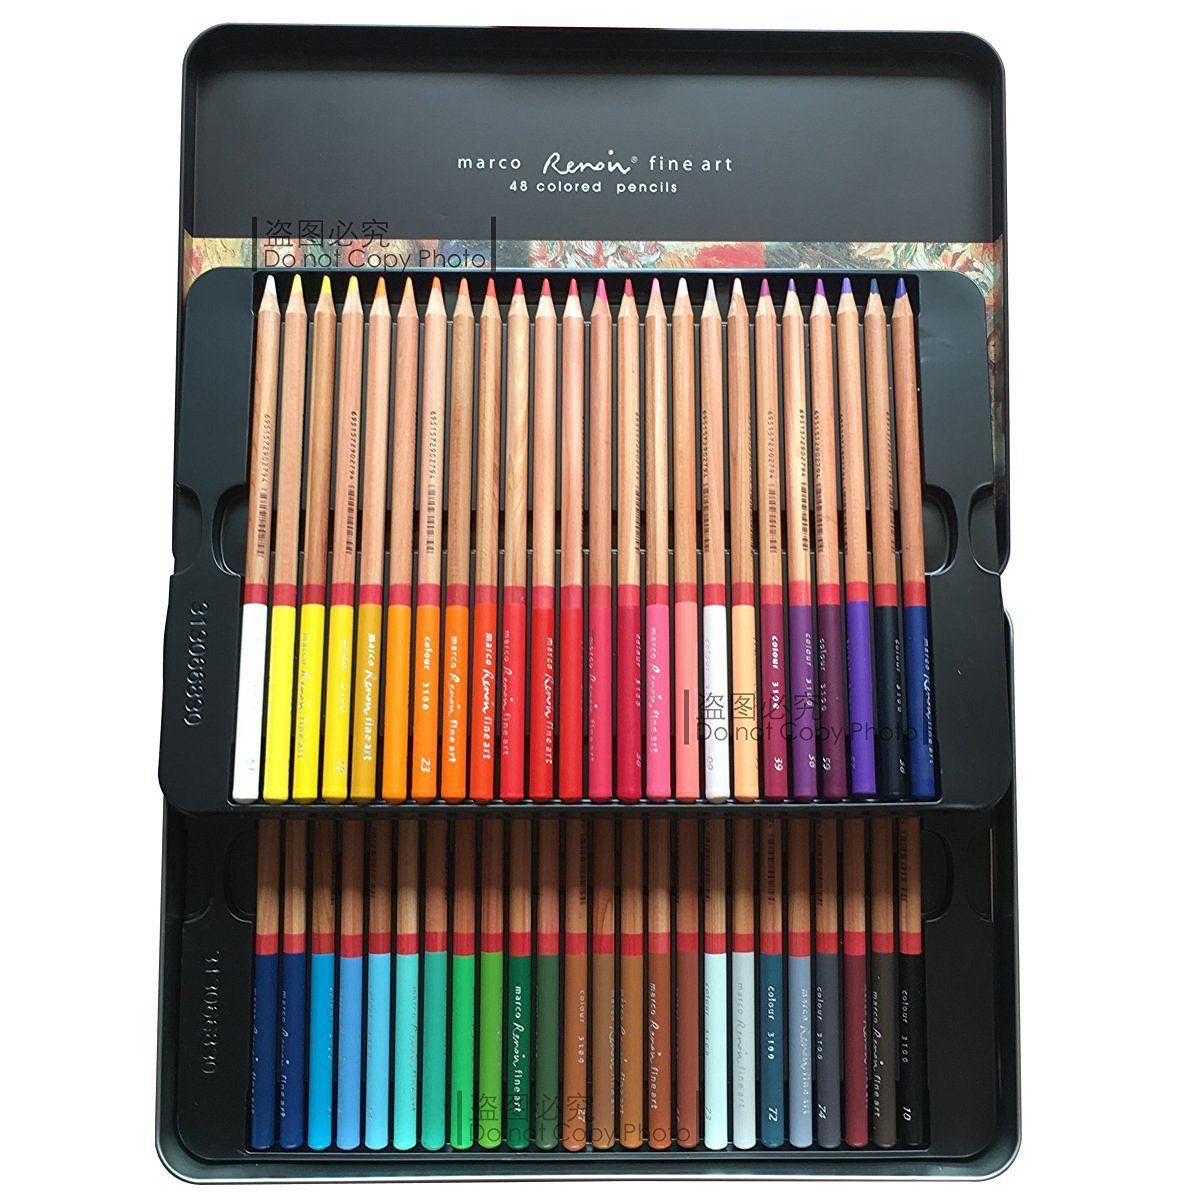 Color art colored pencils - Amazon Com 100 Color Art Colored Pencils For Artist Sketching Drawing